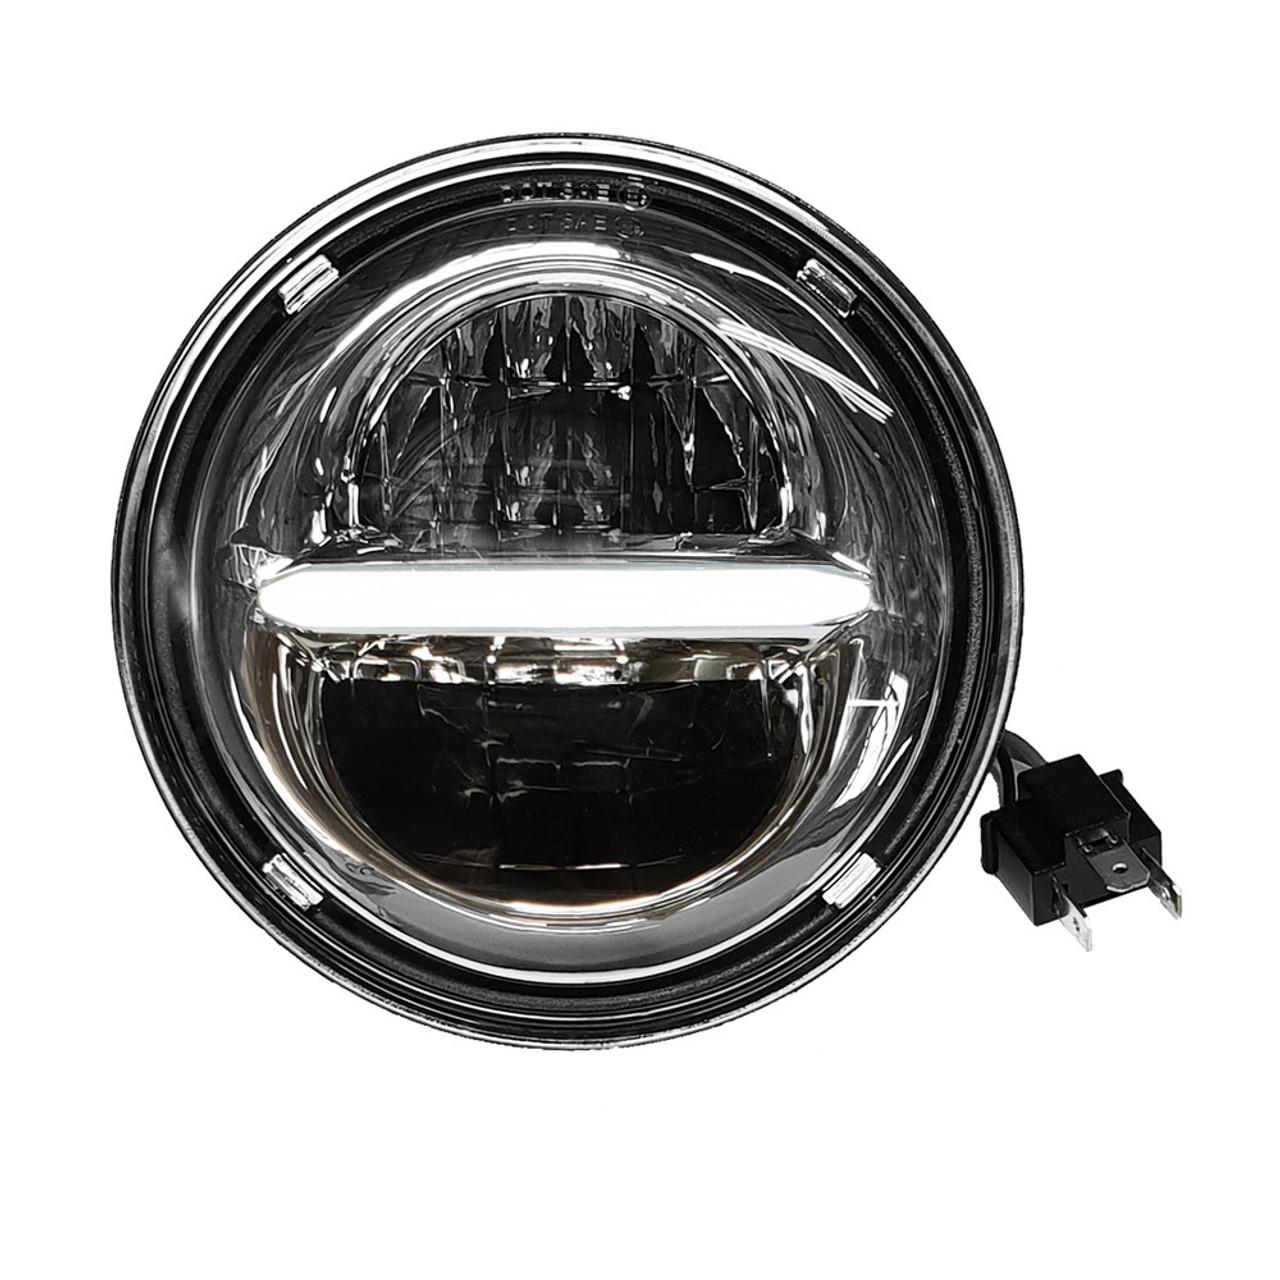 medium resolution of pathfinderled chrome 7 in classic headlight w daytime running lights hd7clc